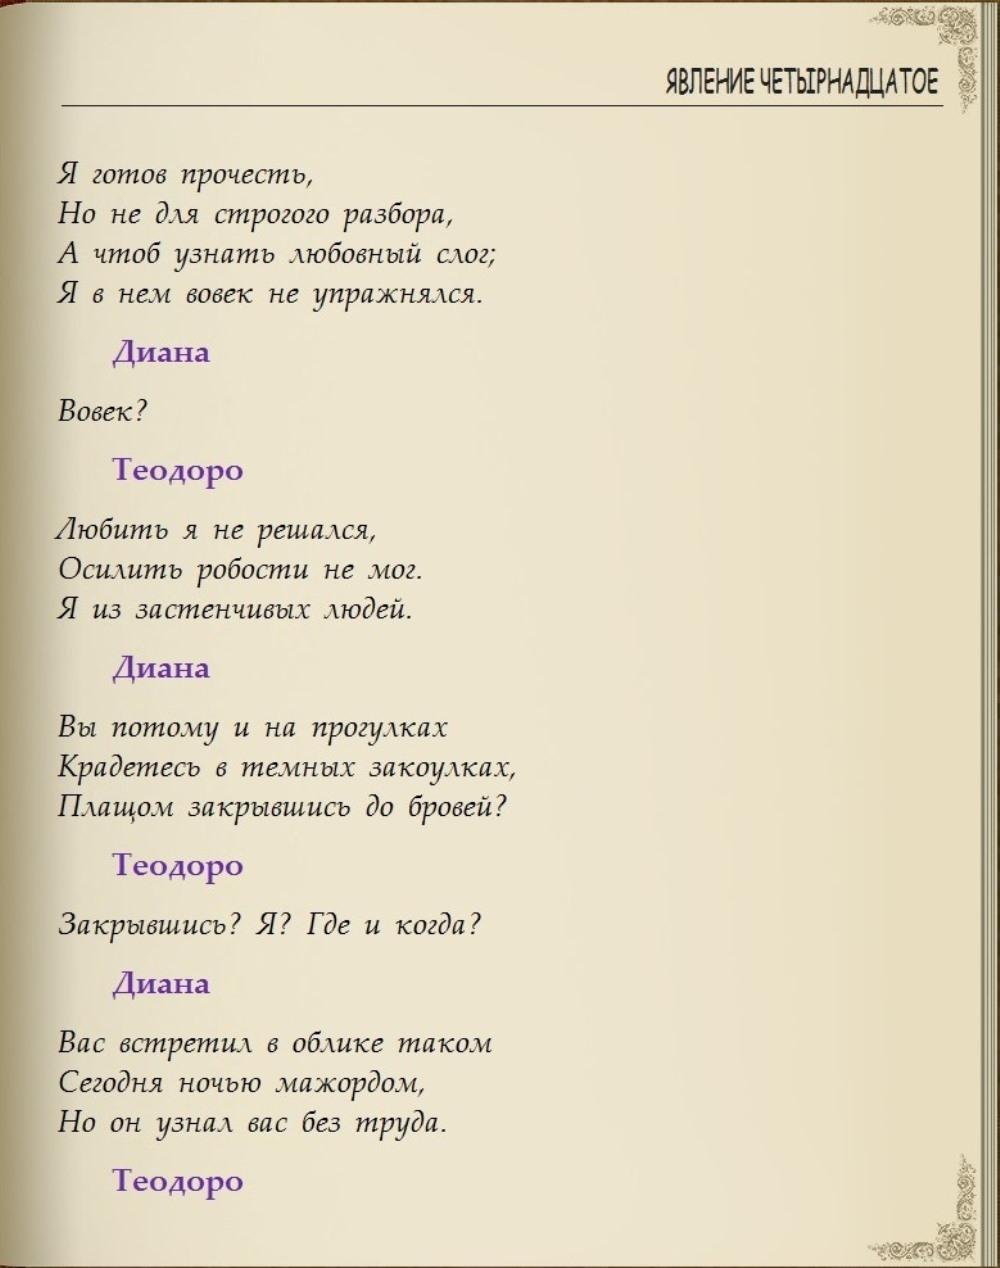 http://i2.imageban.ru/out/2013/11/07/c923099e0fcd2de7d0fabb52531123a2.jpg